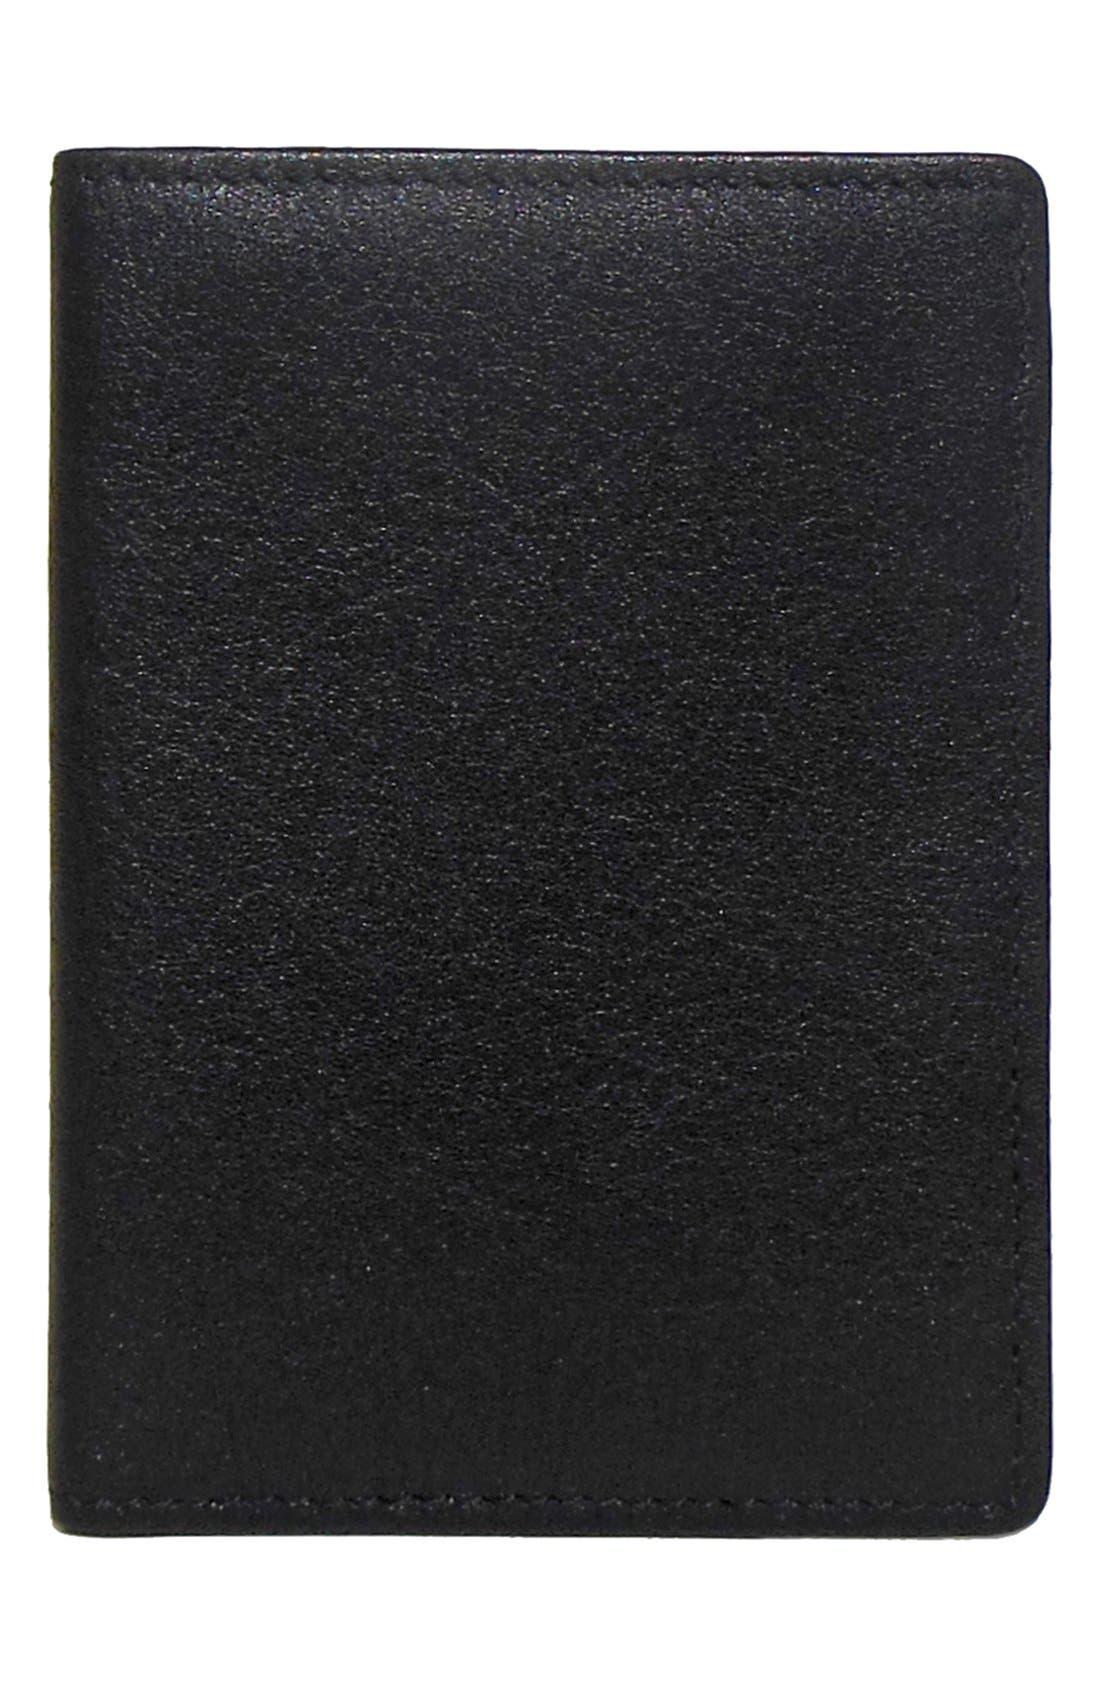 Main Image - Boconi 'George' RFID Blocker Slim Leather Card Case